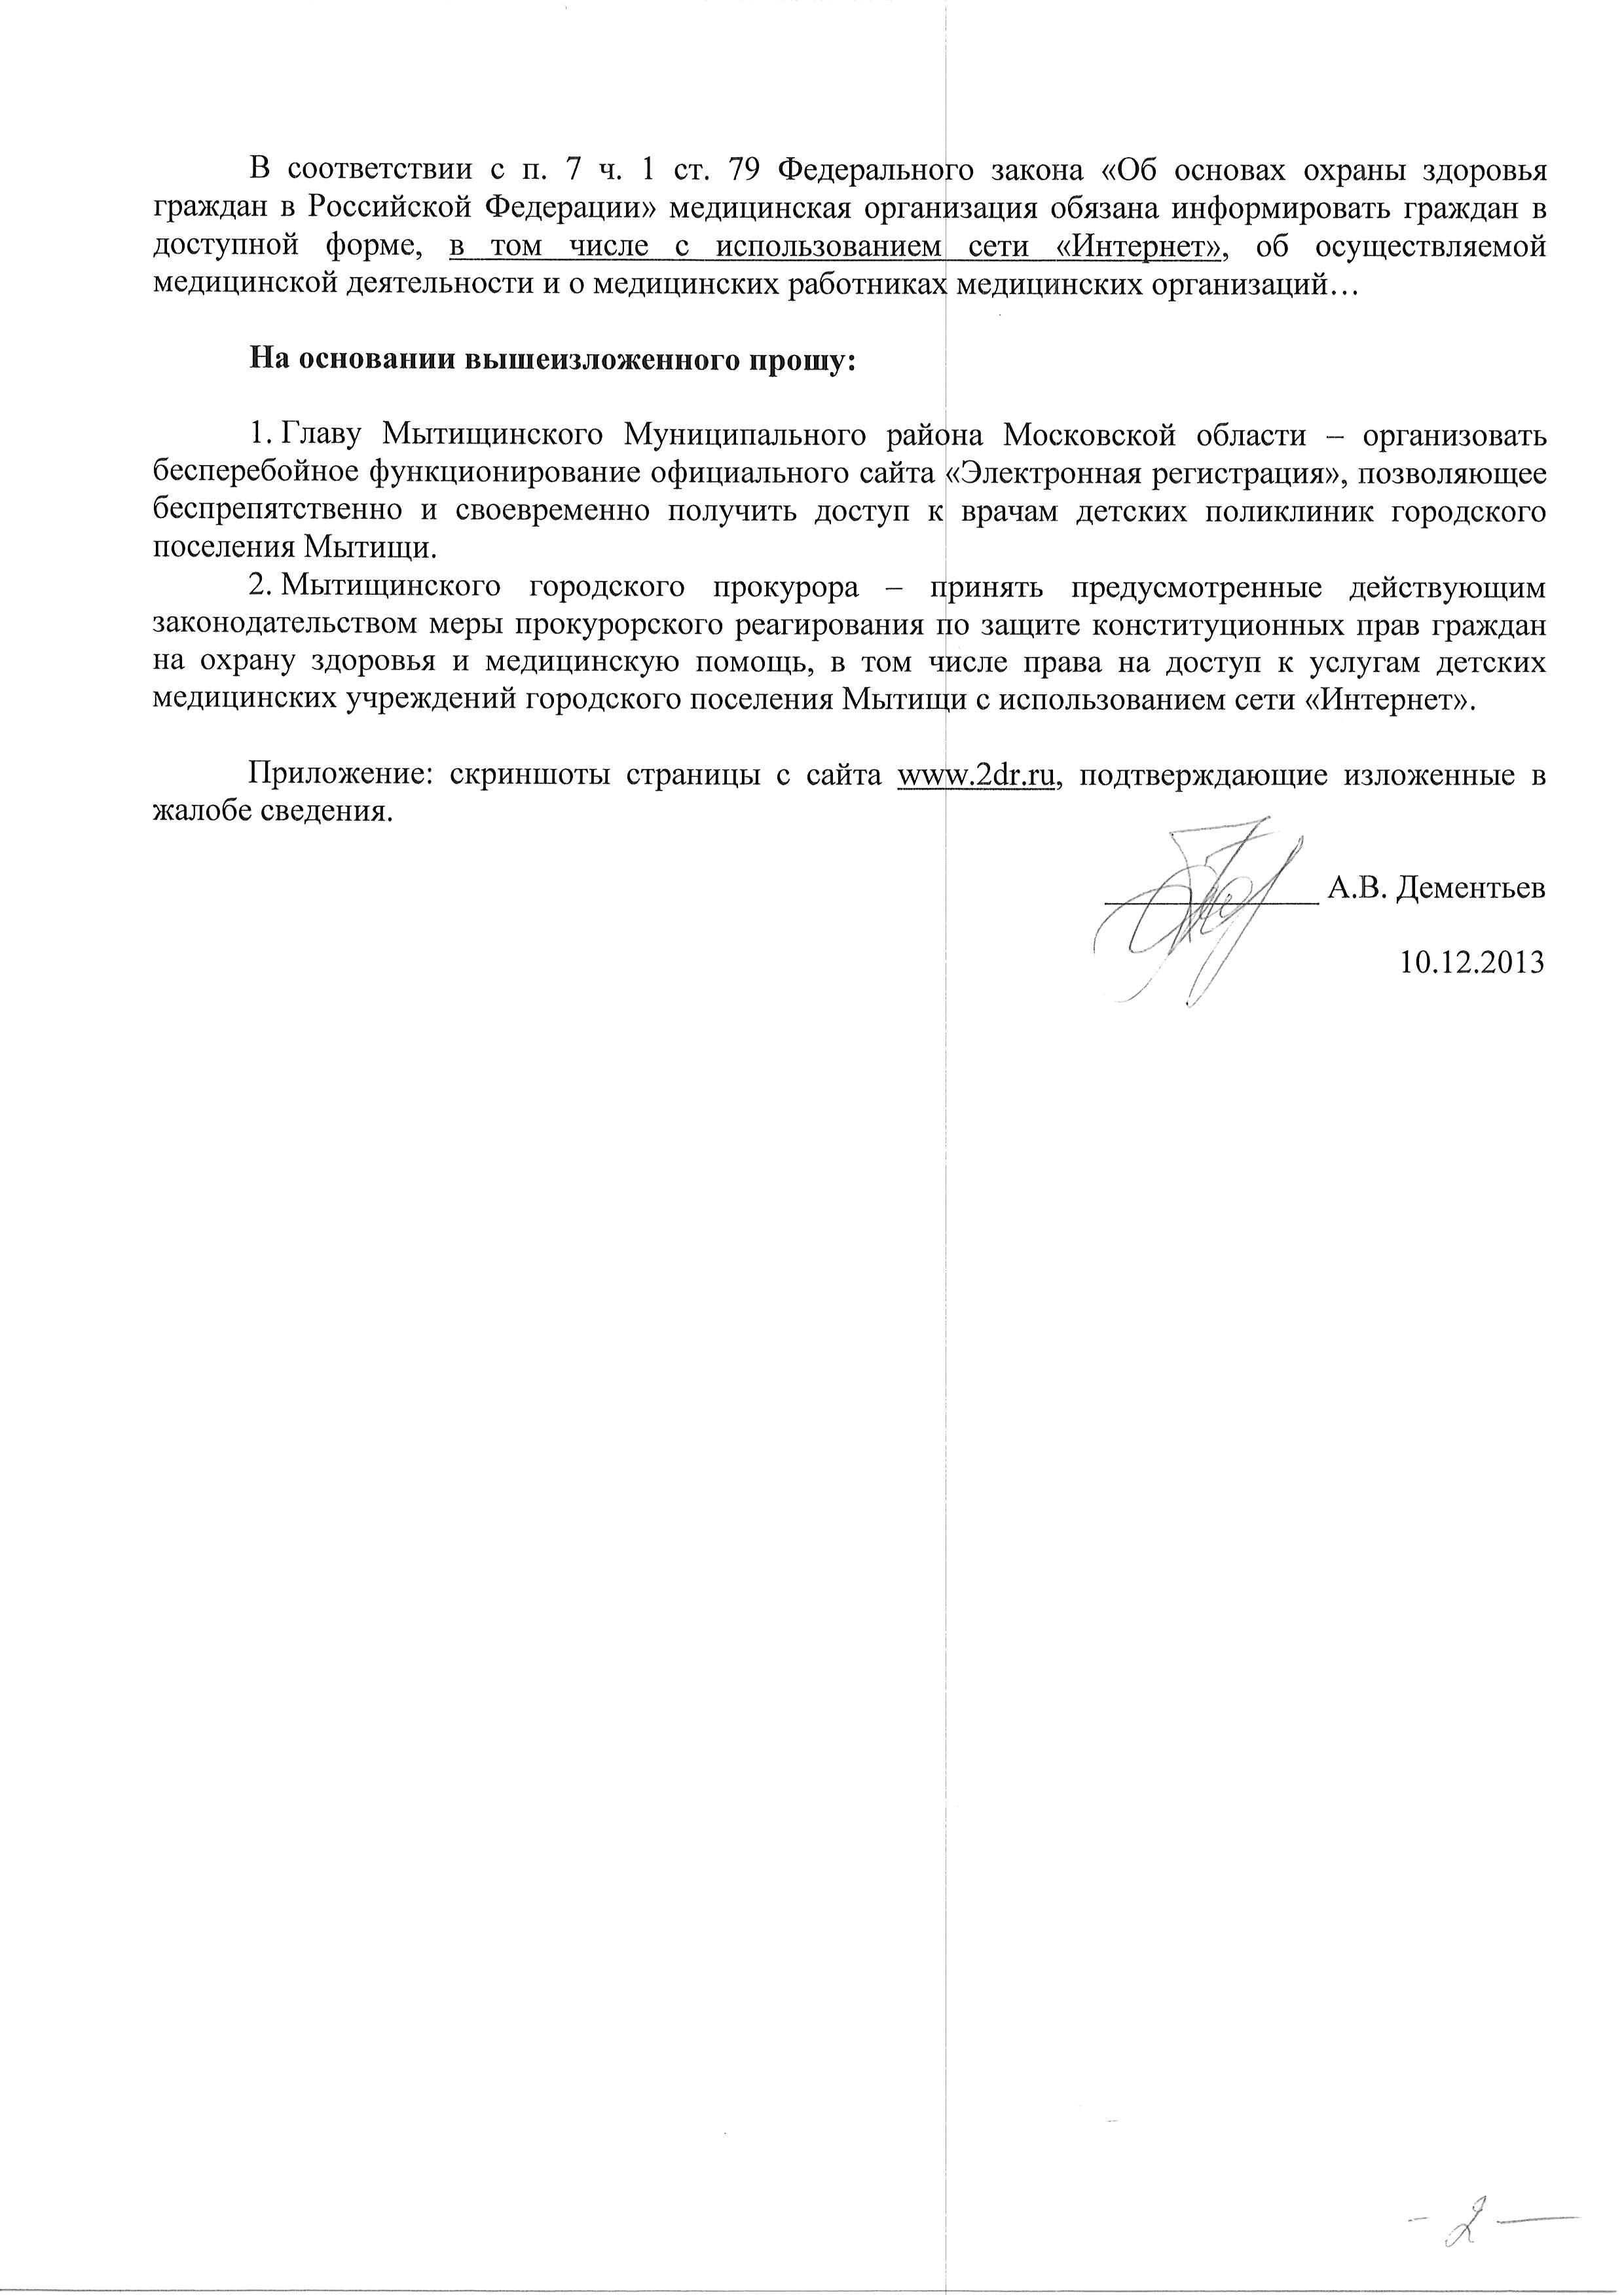 Жалоба Дементьева А.В. (лист 2)